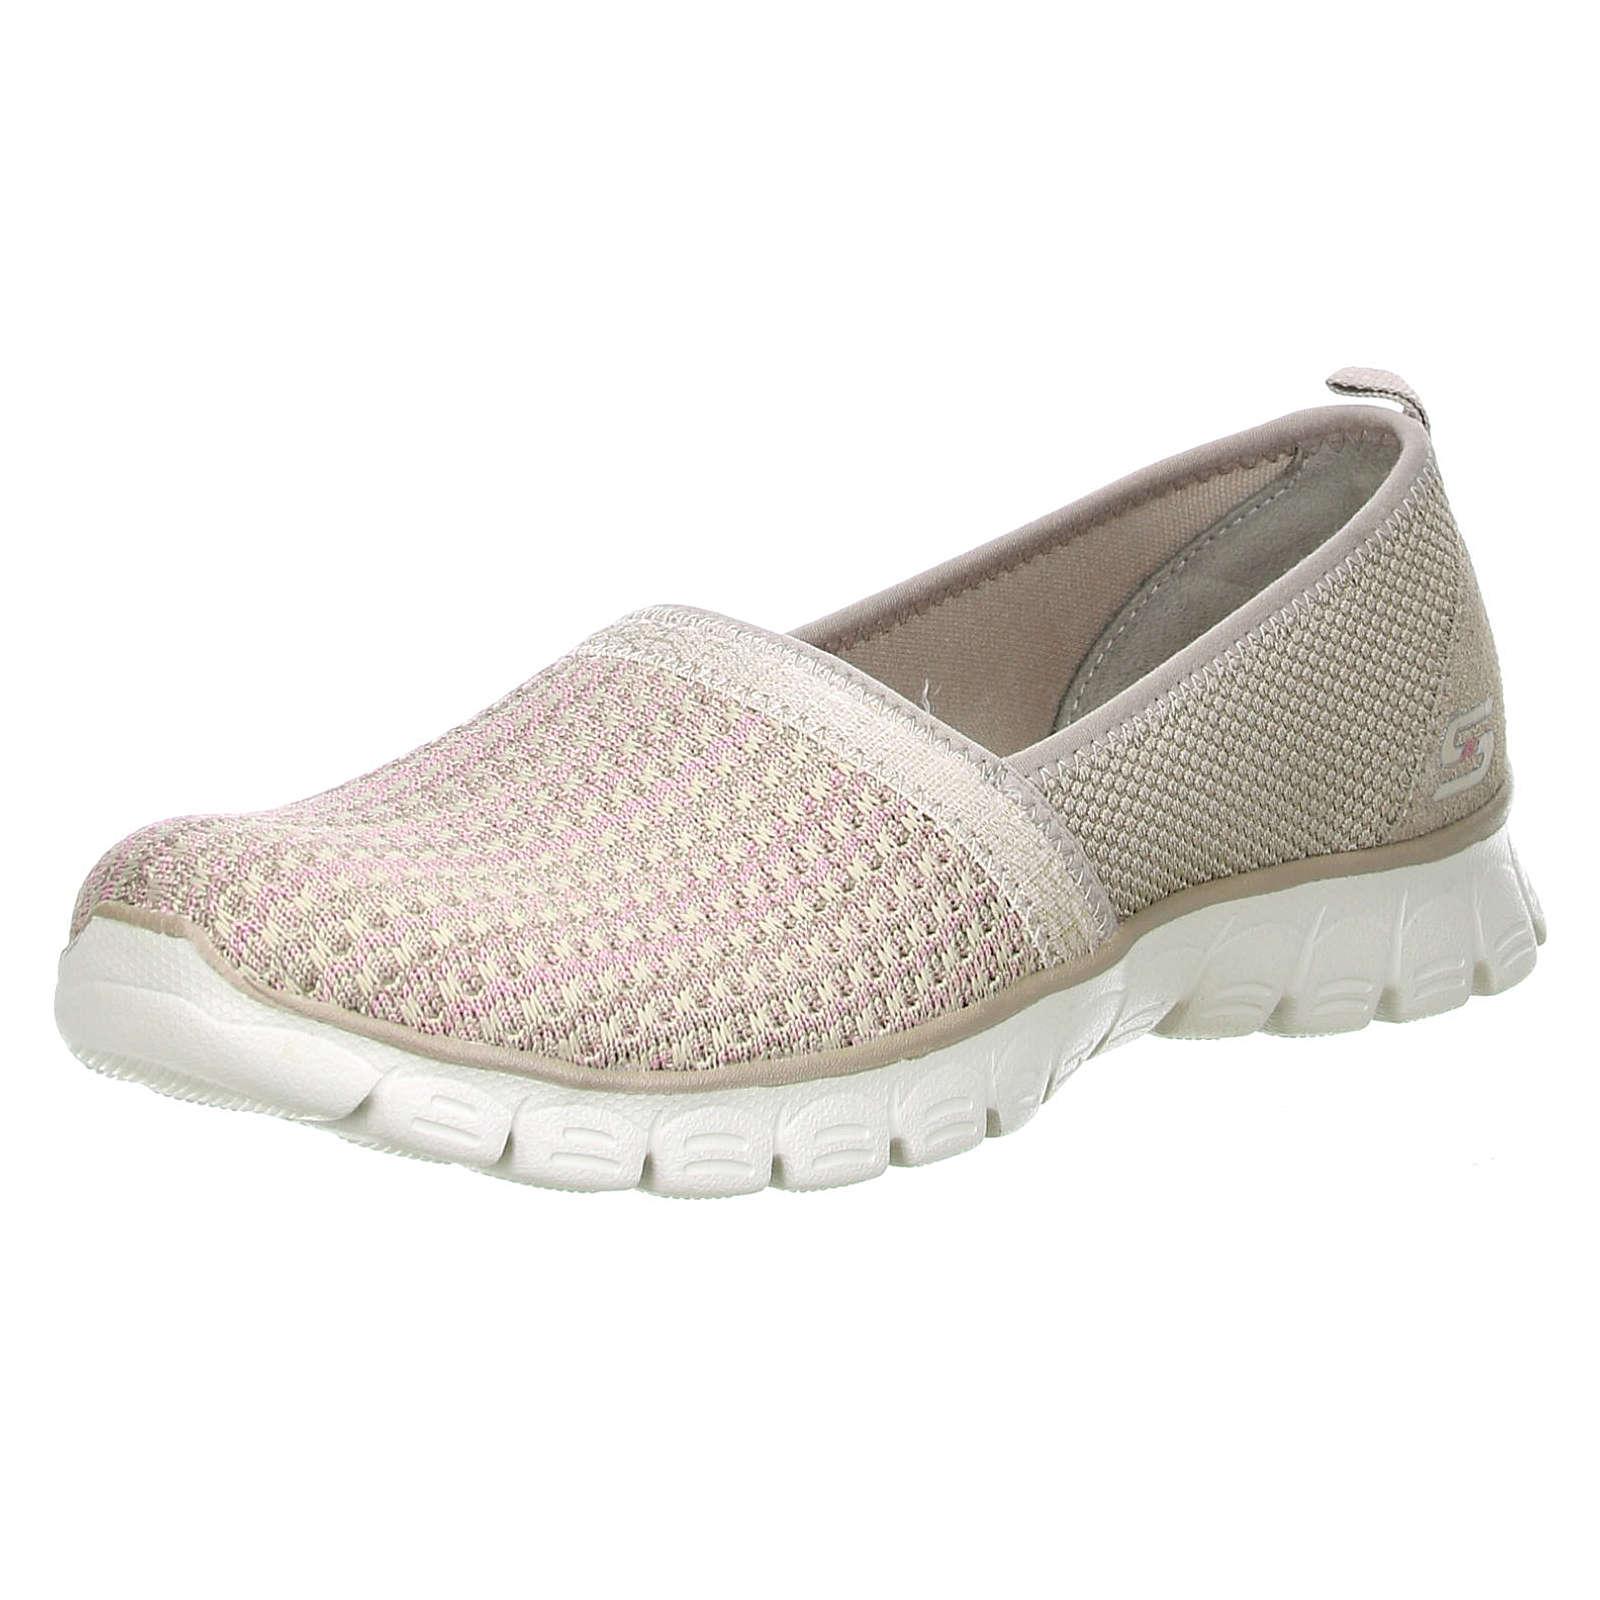 SKECHERS EZ Flex 3.0-Big Money Damen Sneaker Slipper beige/sandfarben/rosa beige Damen Gr. 36